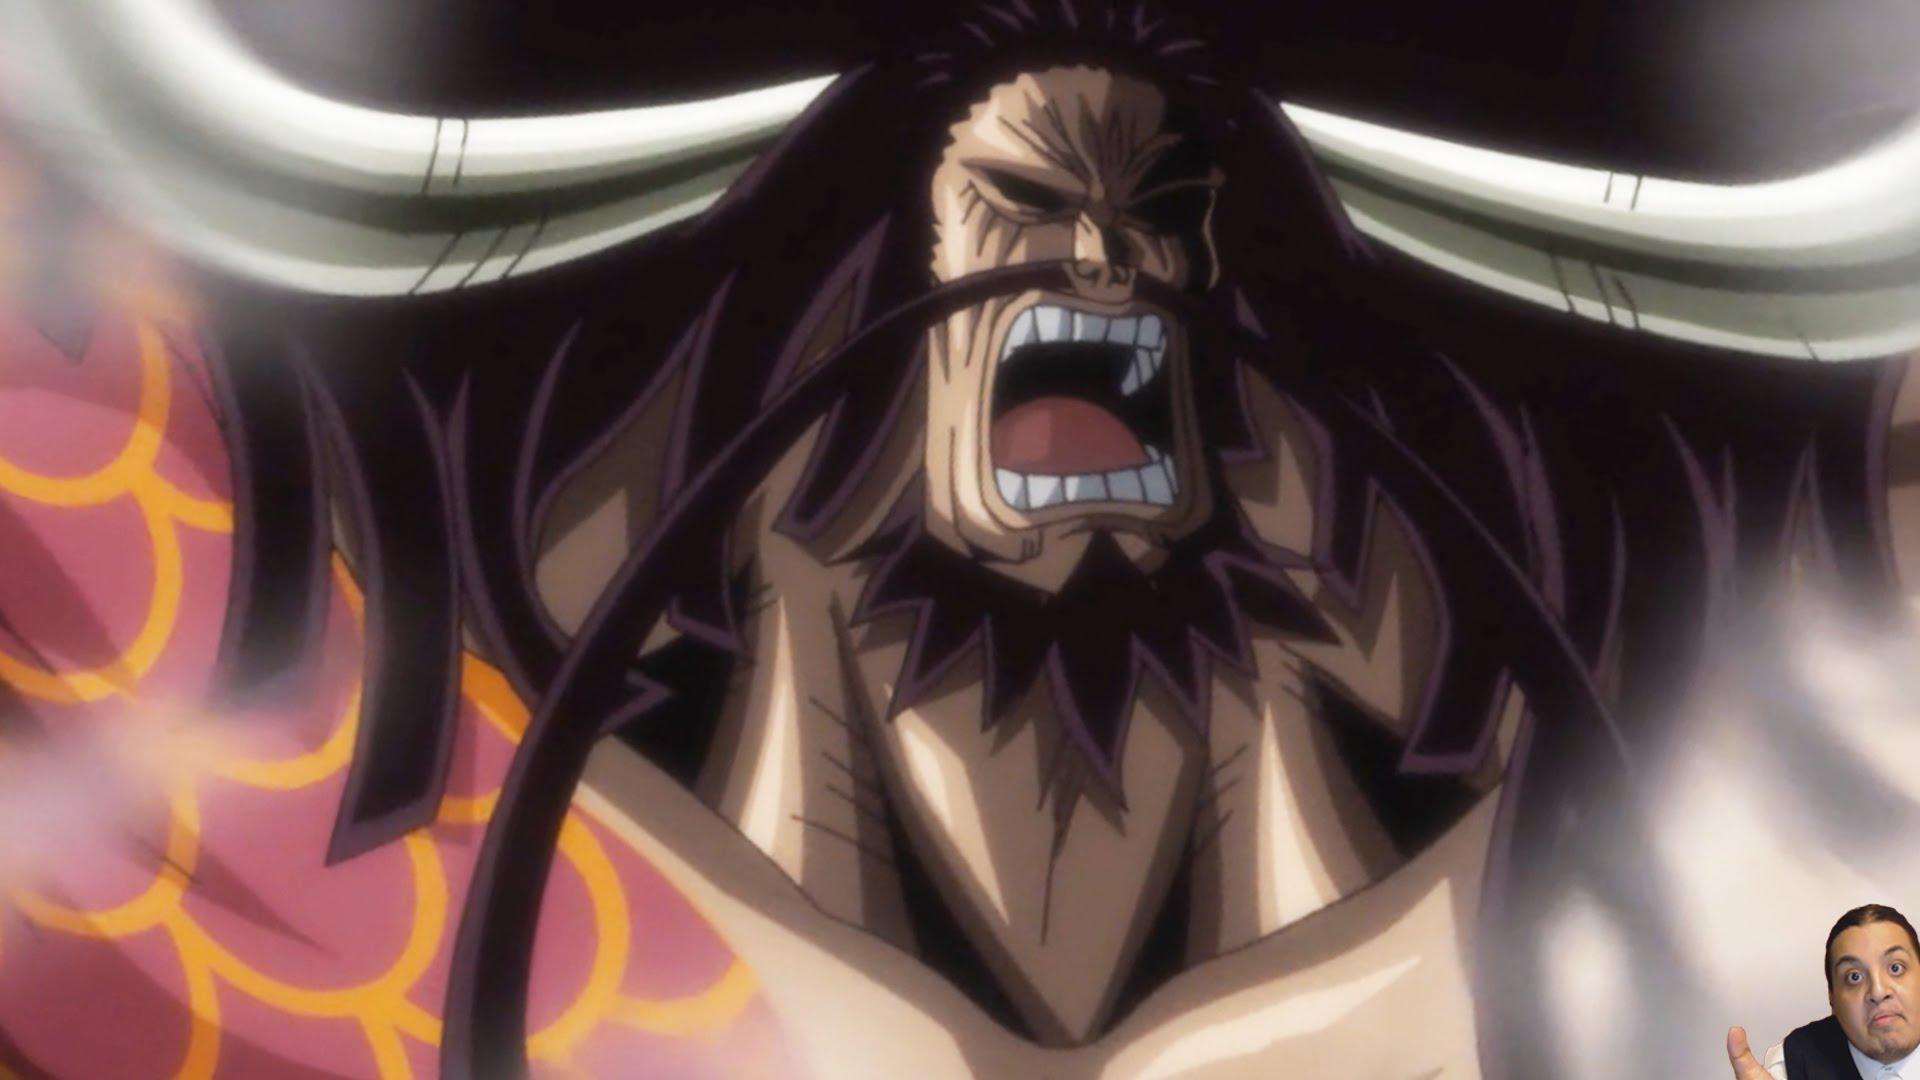 *Kaido The Beast*